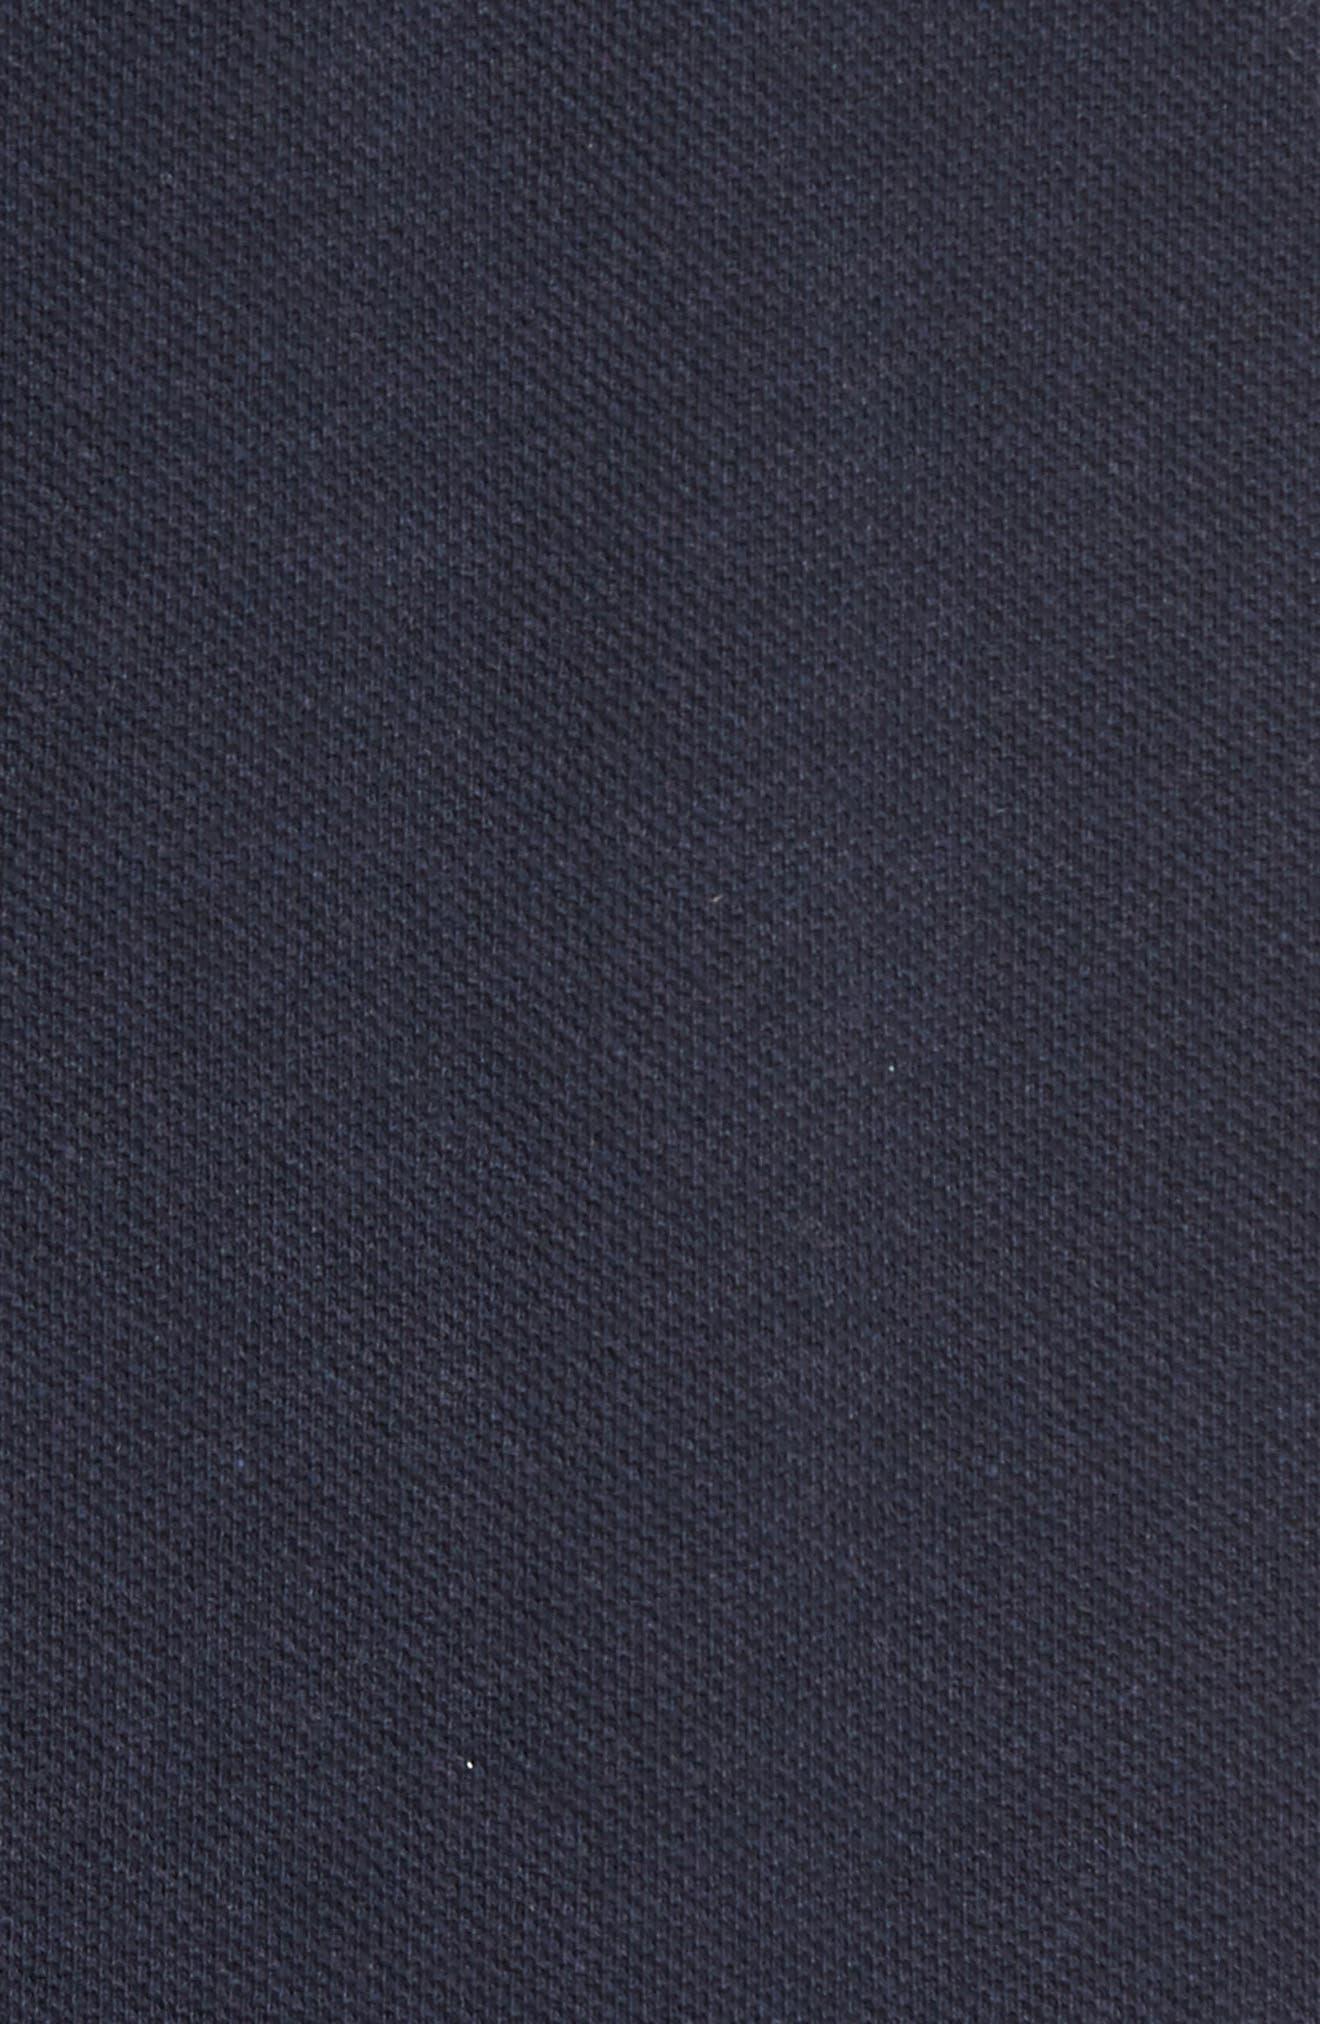 'The Gunn' Piqué Sports Fit Cotton Polo,                             Alternate thumbnail 5, color,                             Navy